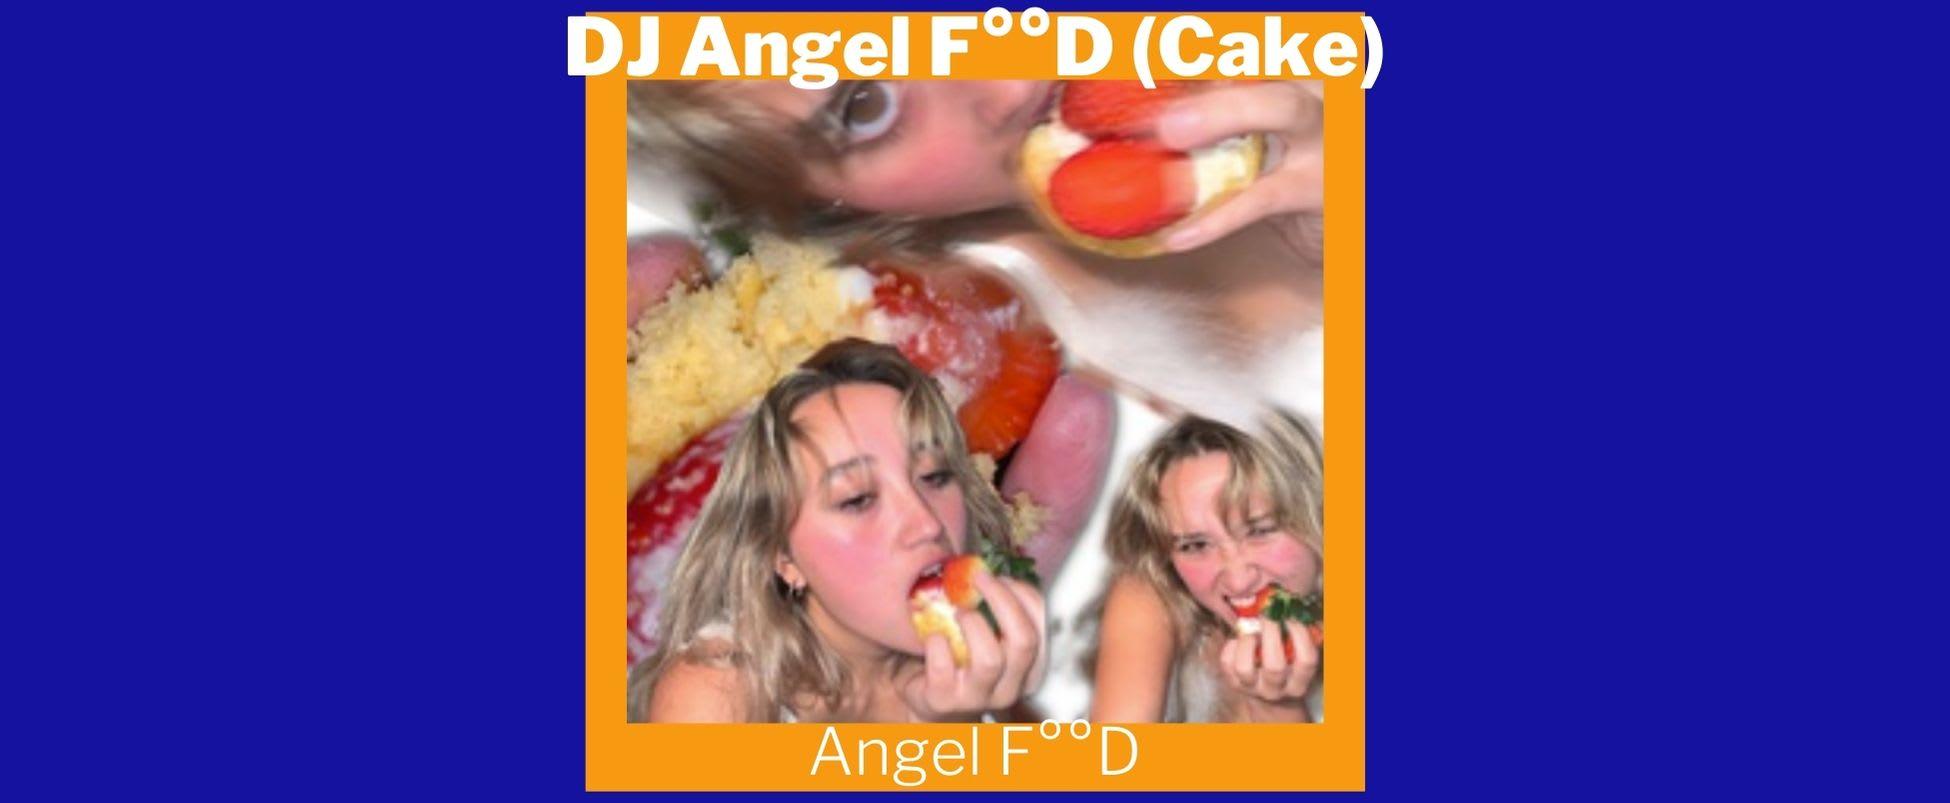 Show Spotlight: Angel F°°D with DJ Angel F°°D (Cake)